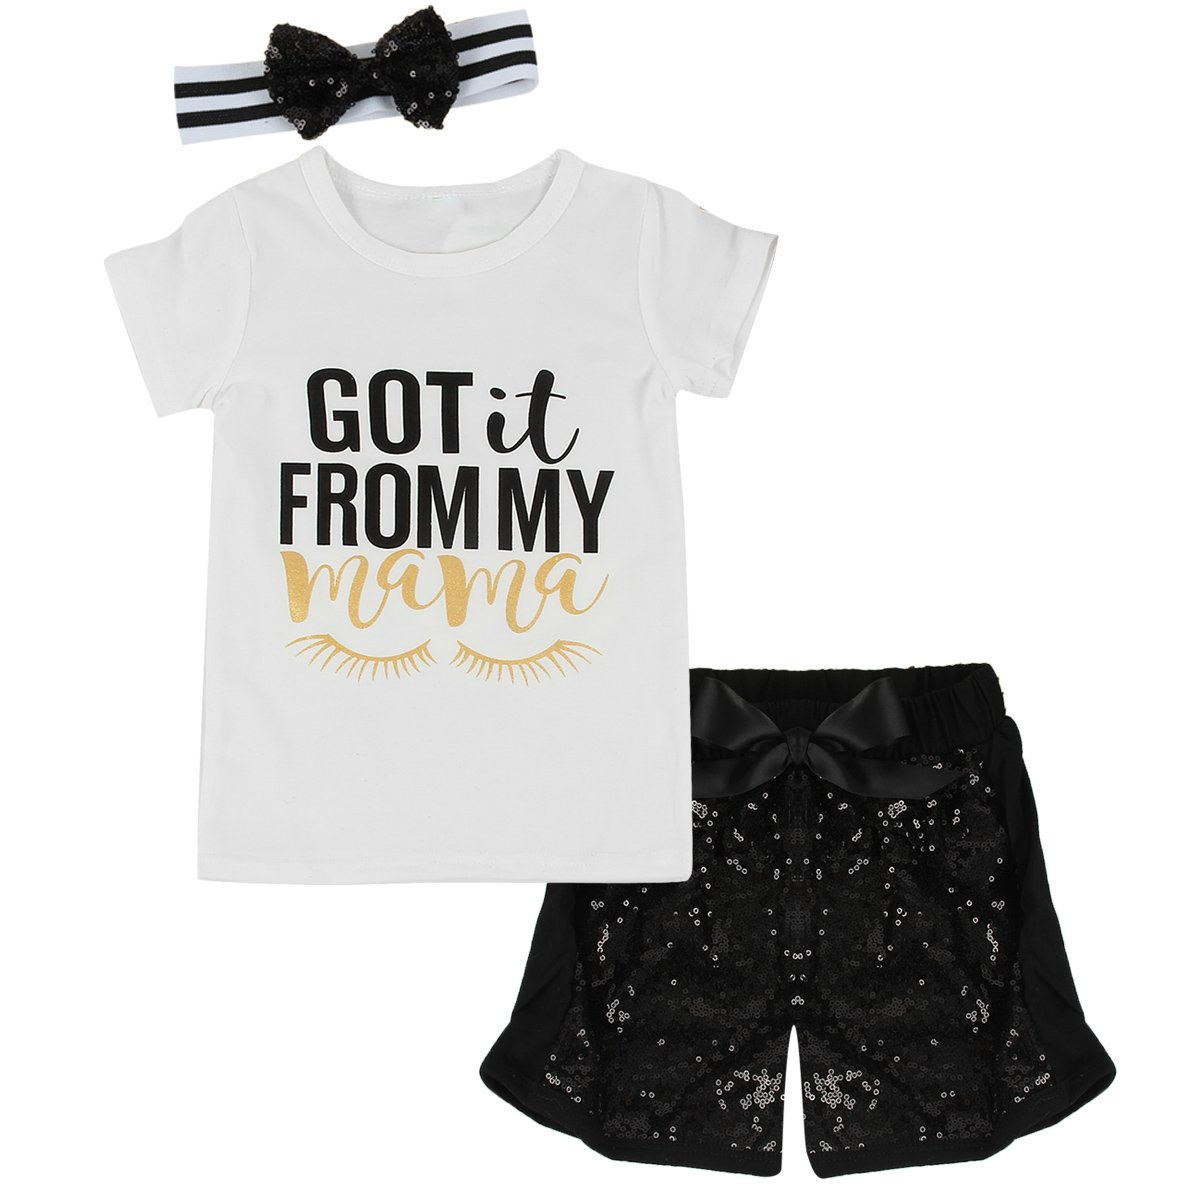 Puseky Toddler Baby Girls Mama T-shirt+Sequined Shorts+Headband 3pcs Outfits Set (2T-3T, White+Black)